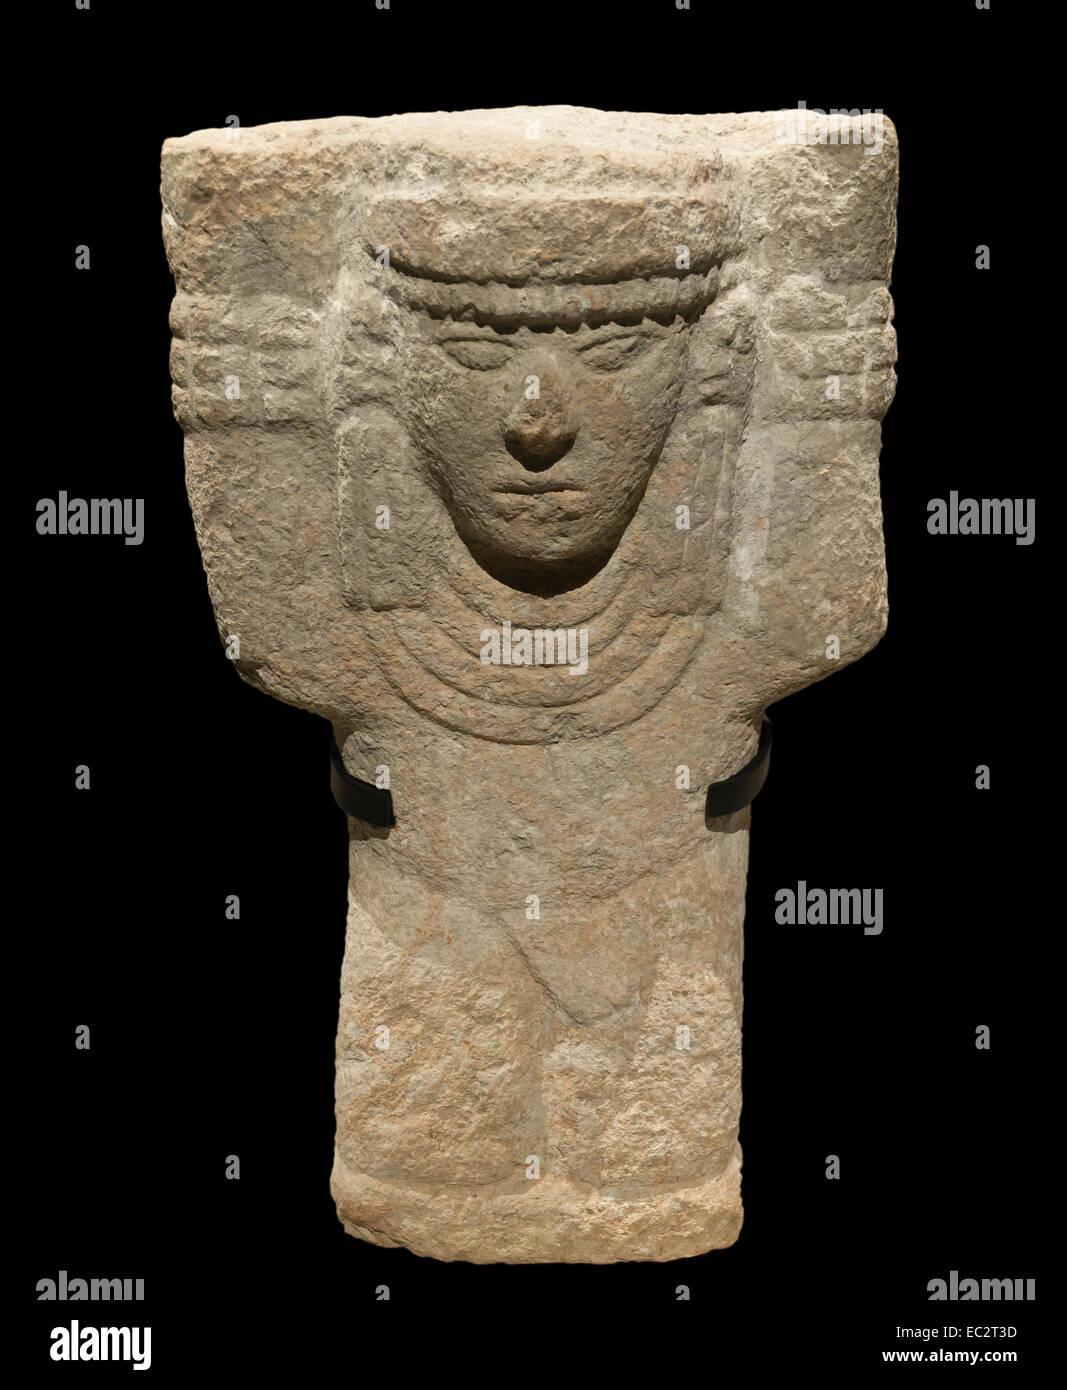 Maya kneeling atlante, Post-classic era (900 - 1250 CE), limestone, Chichén Itza, Yucatan, Mexico. - Stock Image